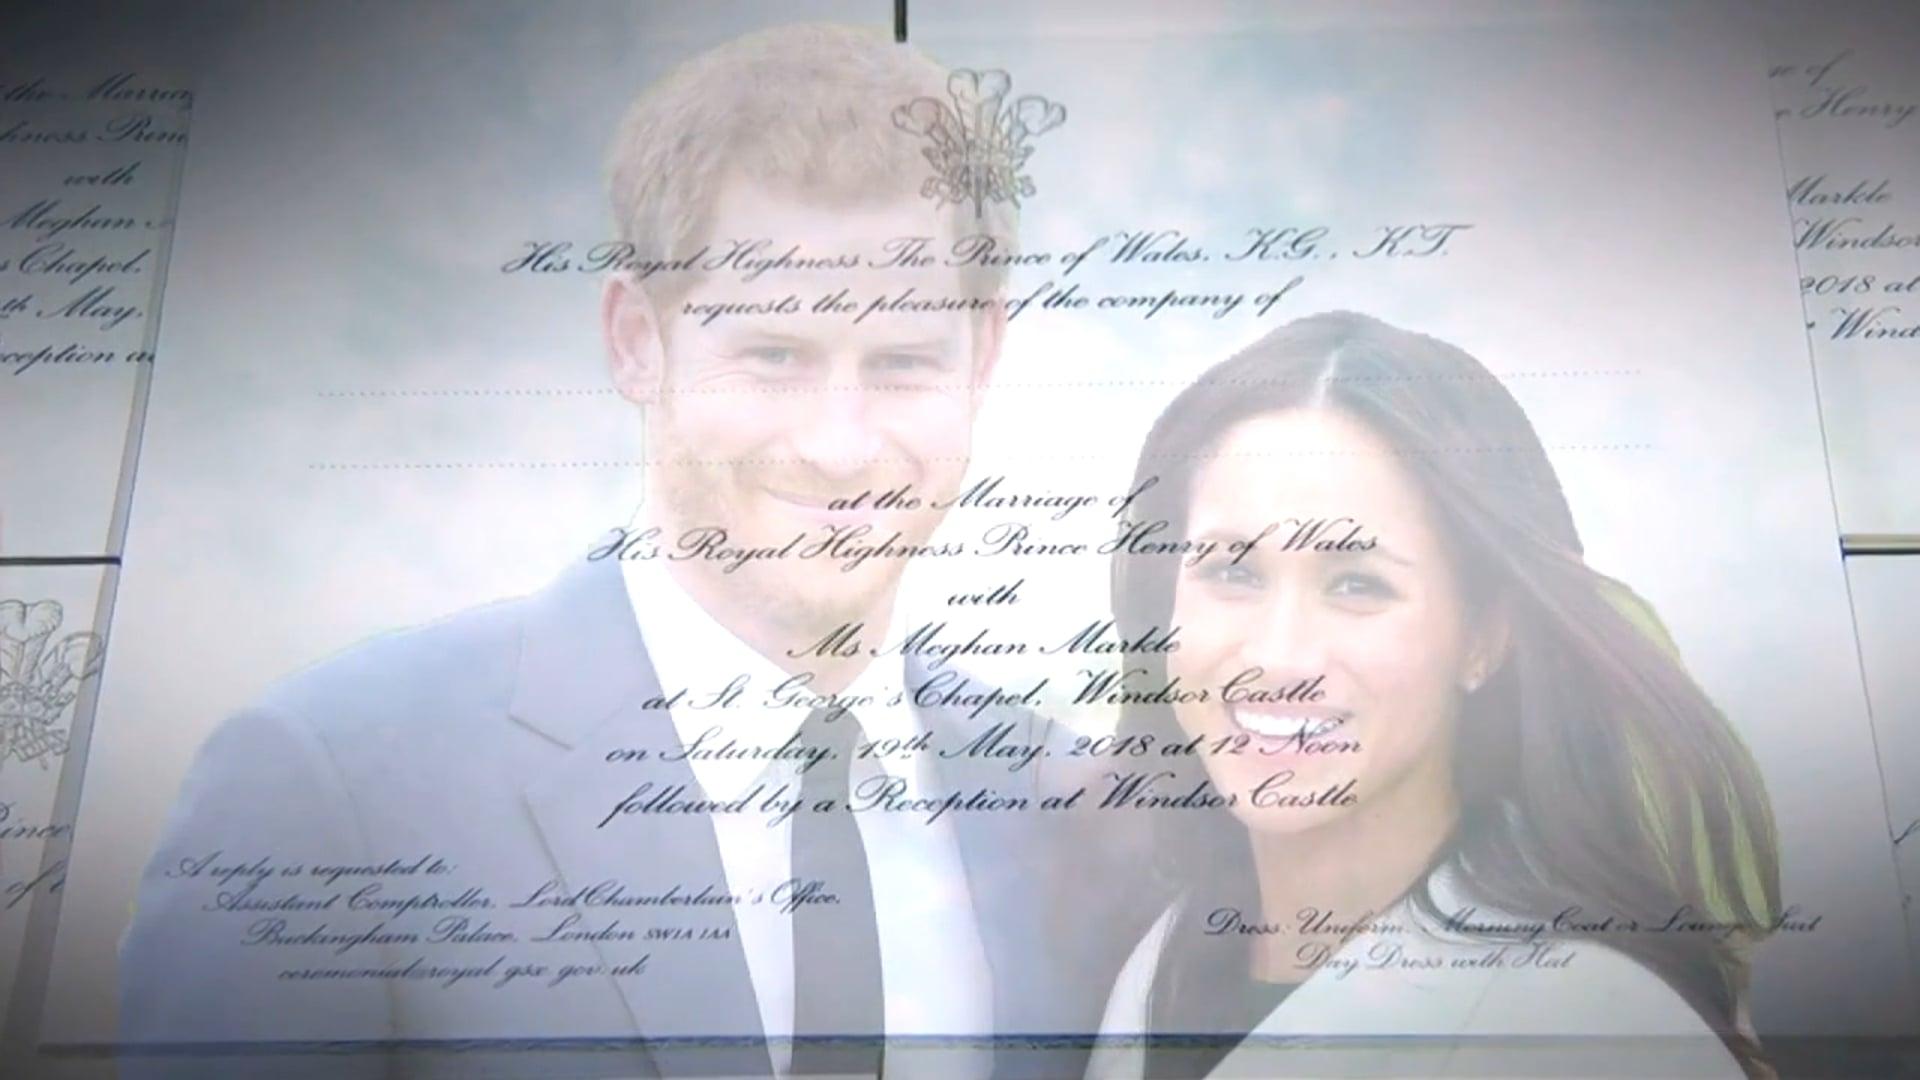 WLRN Royal Wedding Promo